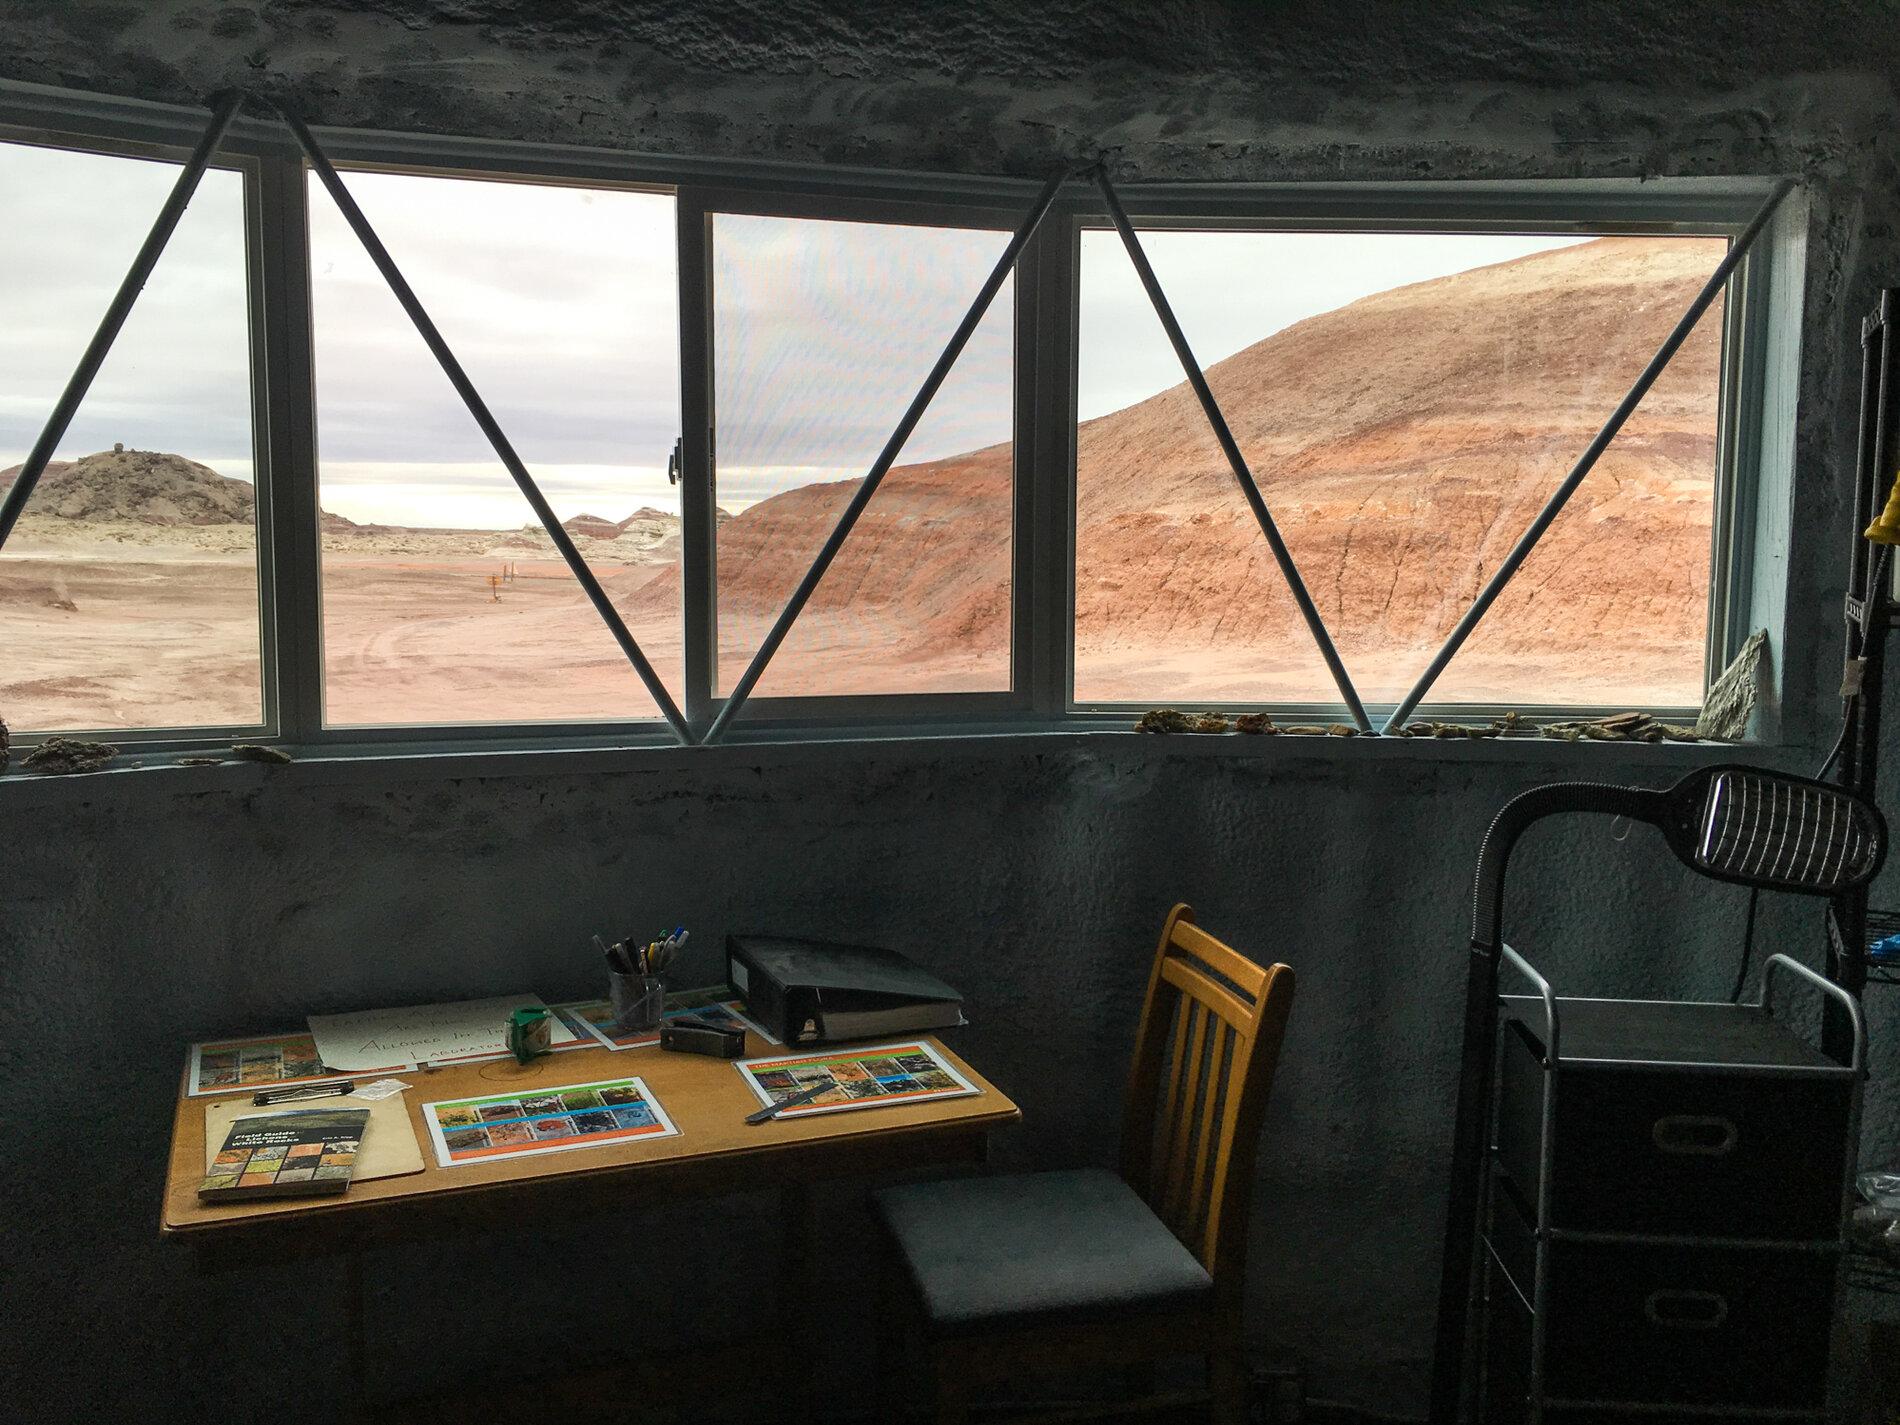 A window in the station's science lab looks out onto Utah's Mars-like desert landscape.     (Rae Ellen Bichell/NPR)